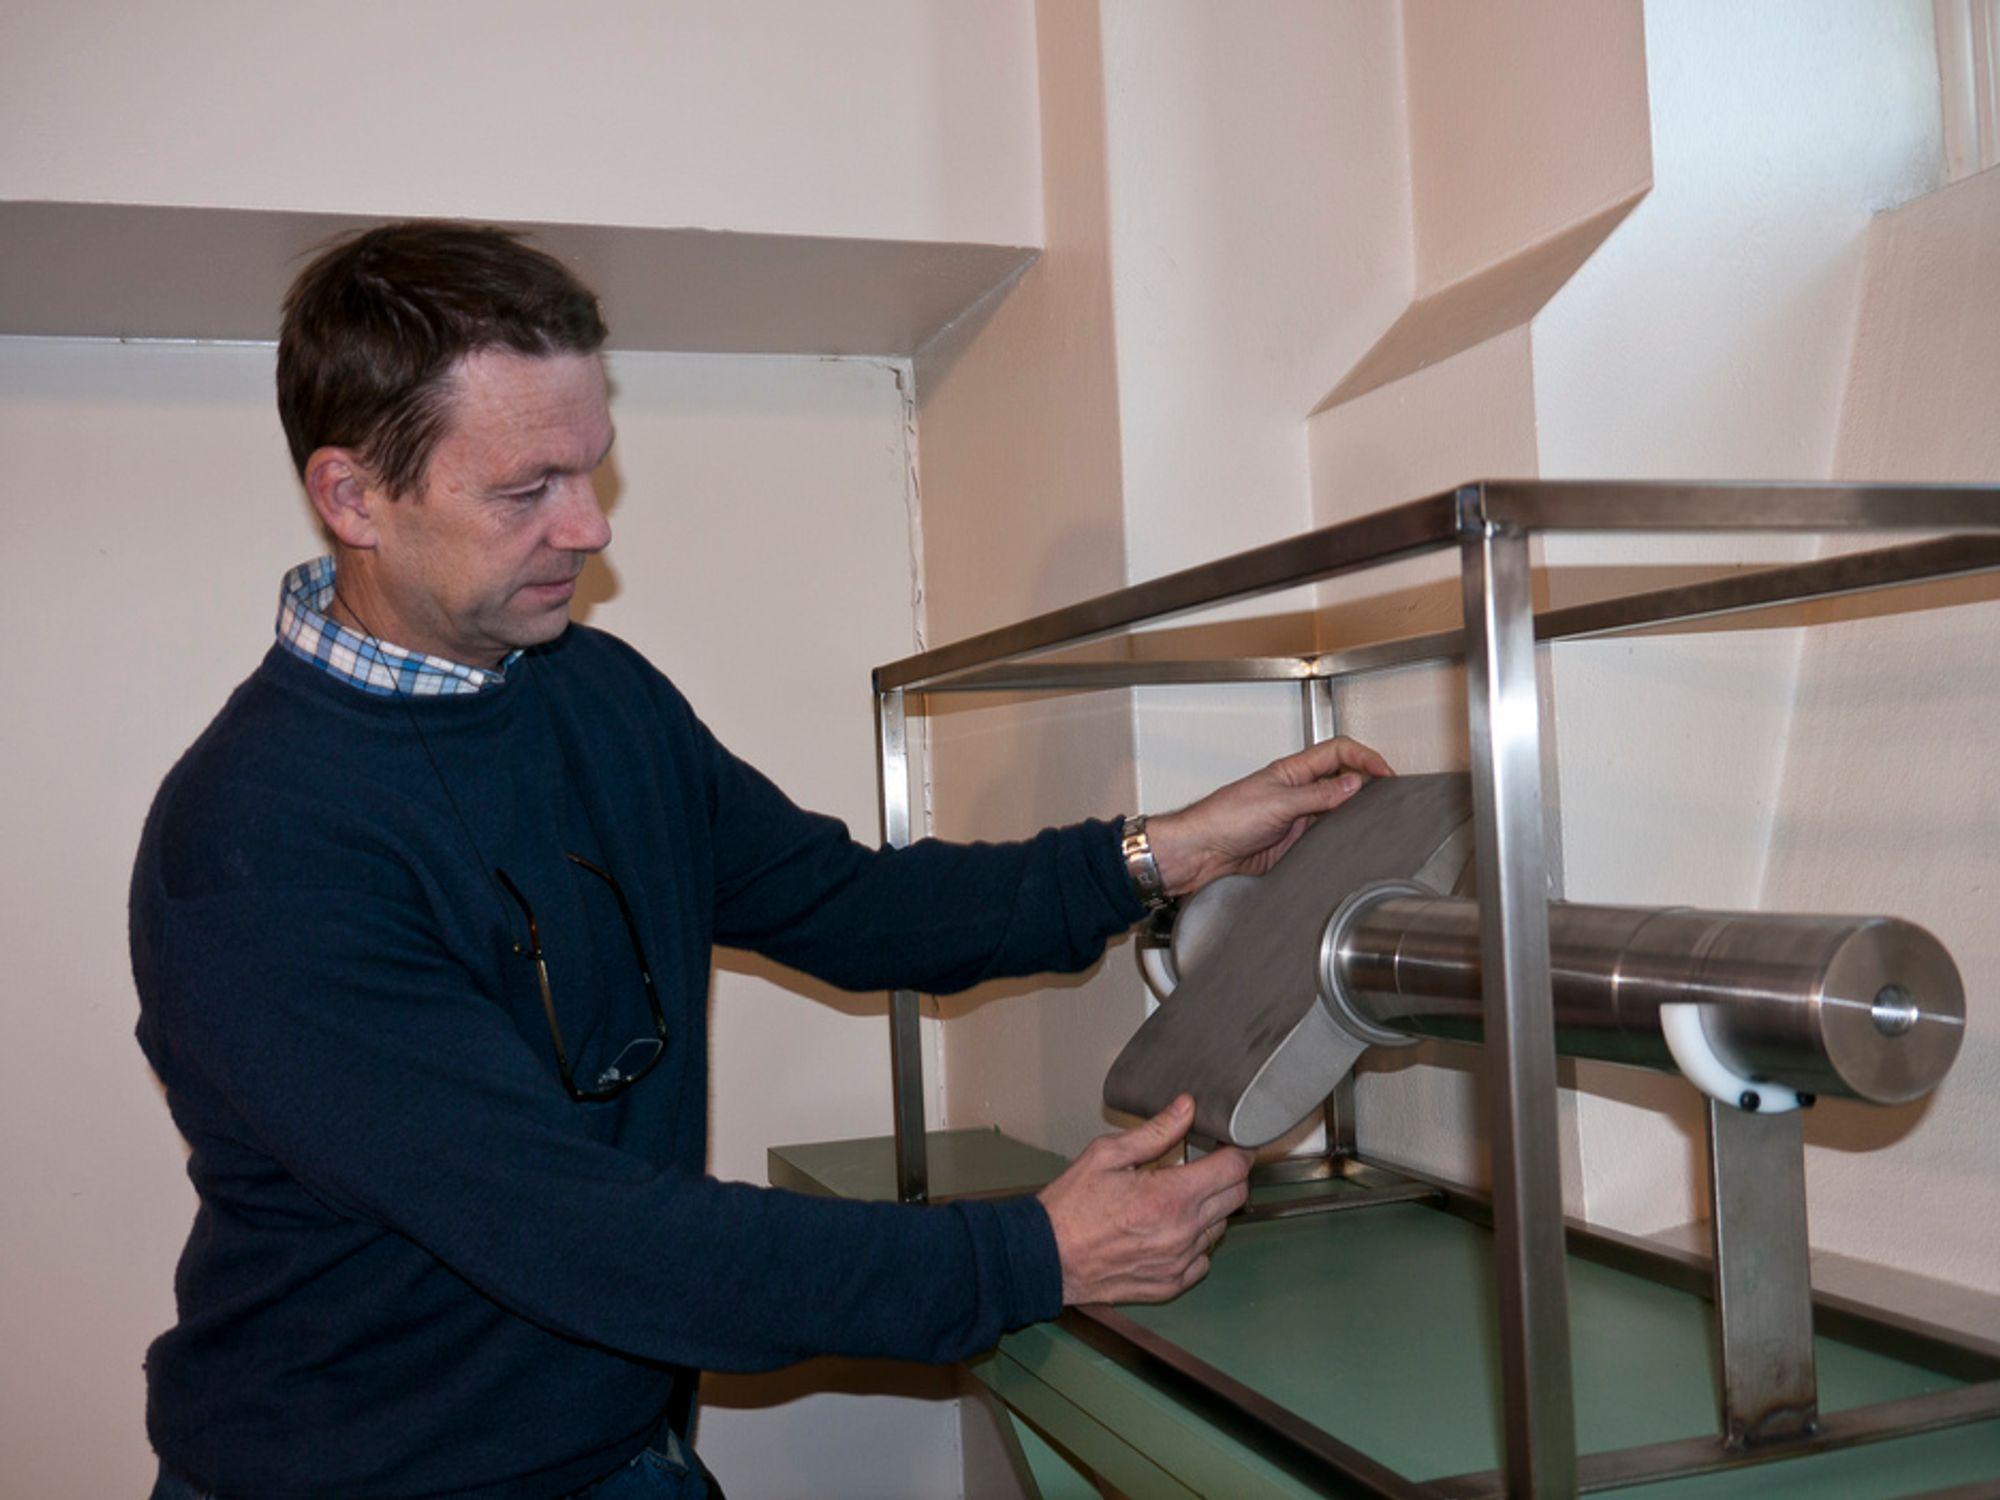 KOMPLISERT DESIGN: Professor ved Vannkraftlaboratoriet ved NTNU, Ole Gunnar Dahlhaug, viser frem en lederskovl sprøytet med Wolframkarbid til den nye sammenskrudde norske turbinen.